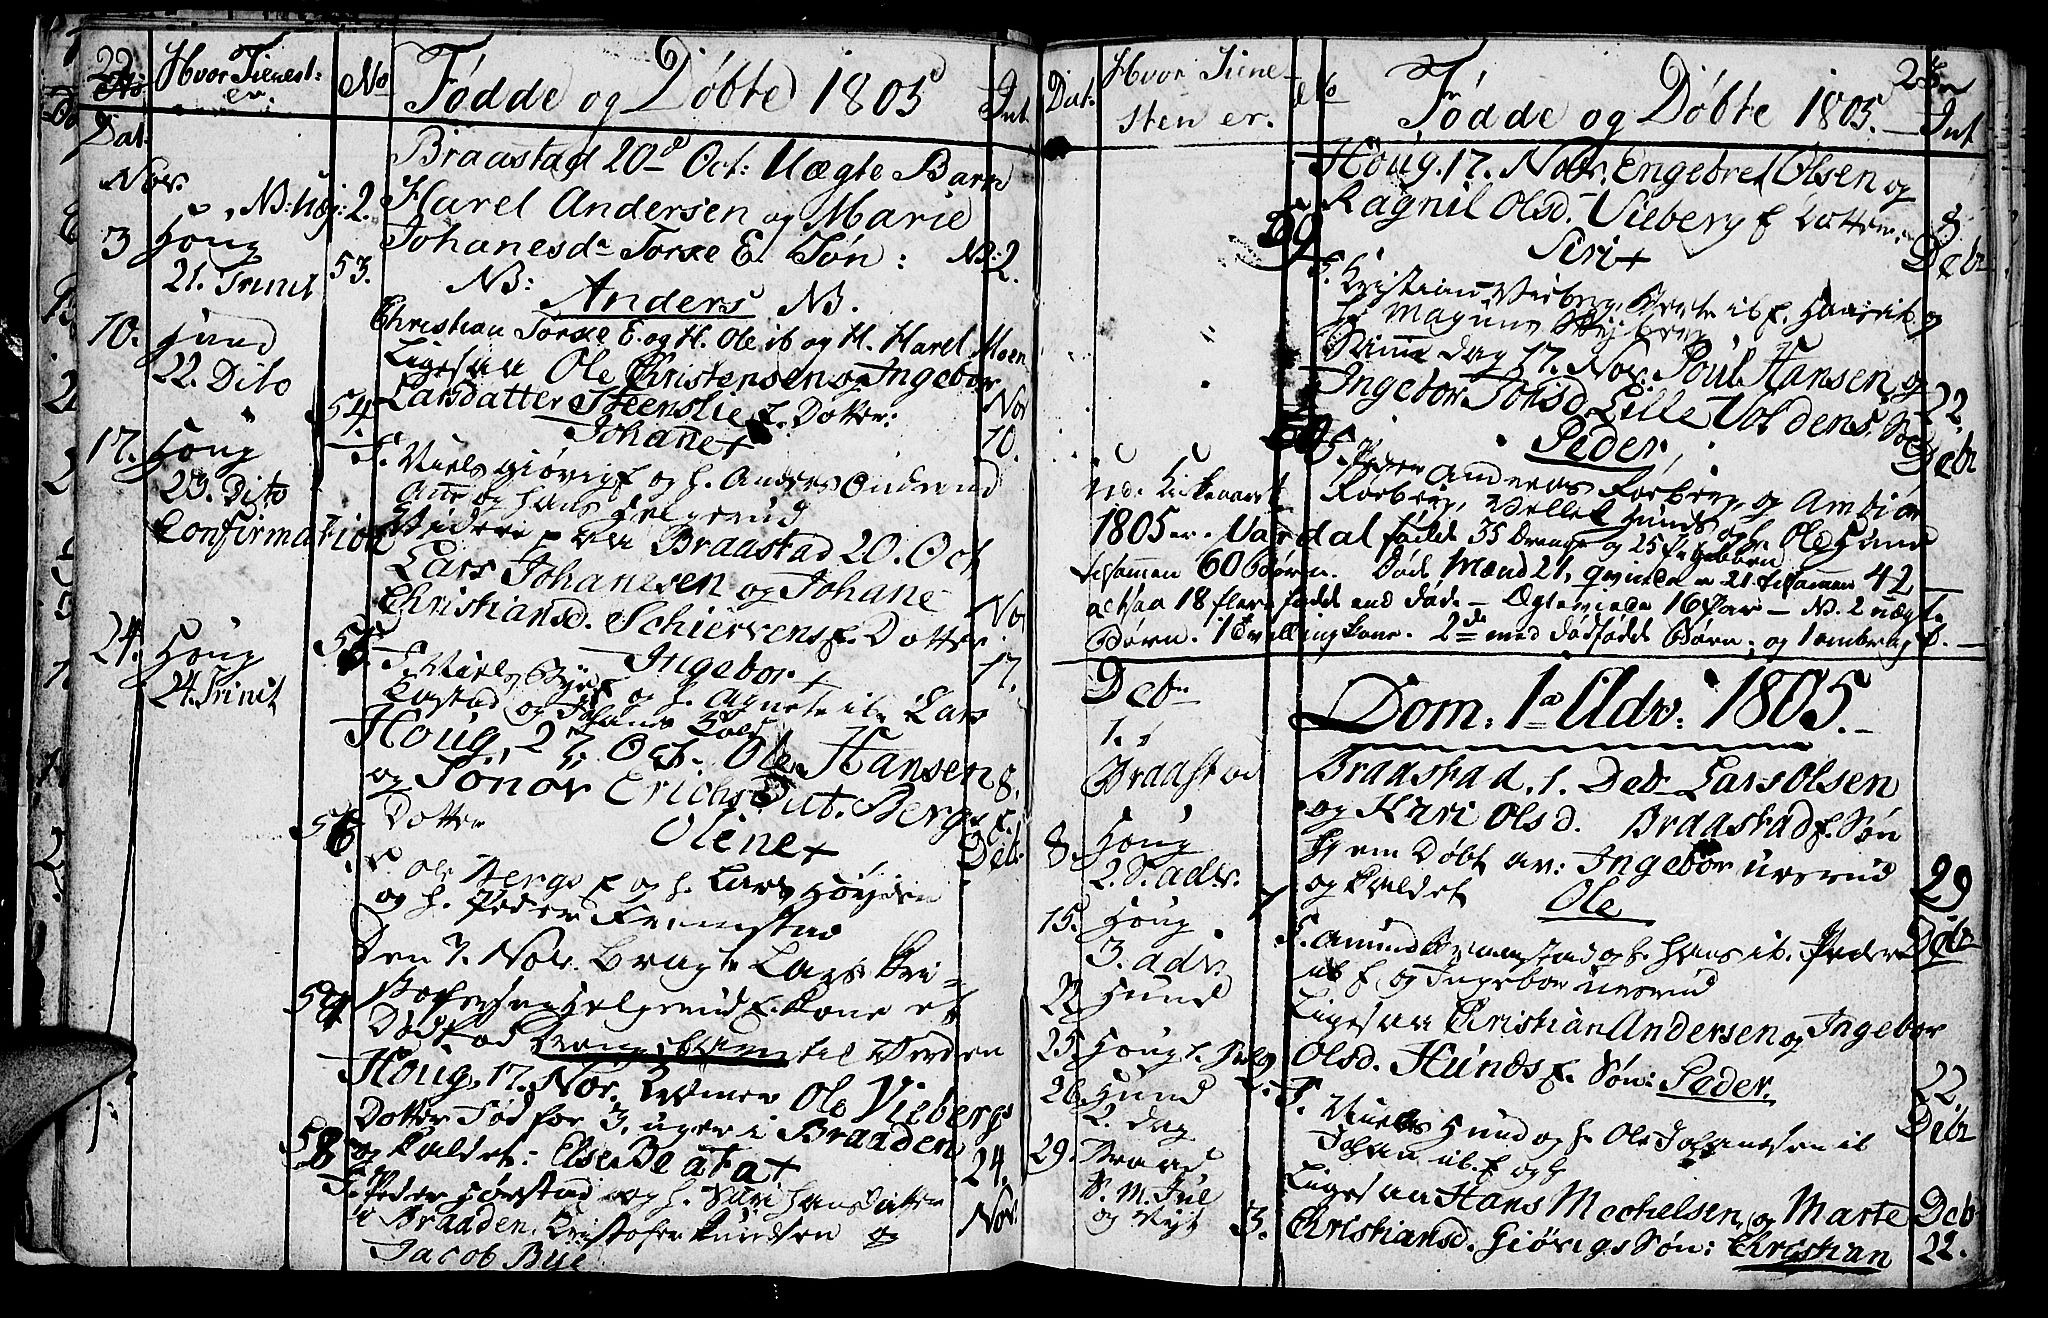 SAH, Vardal prestekontor, H/Ha/Hab/L0003: Klokkerbok nr. 3, 1803-1808, s. 22-23